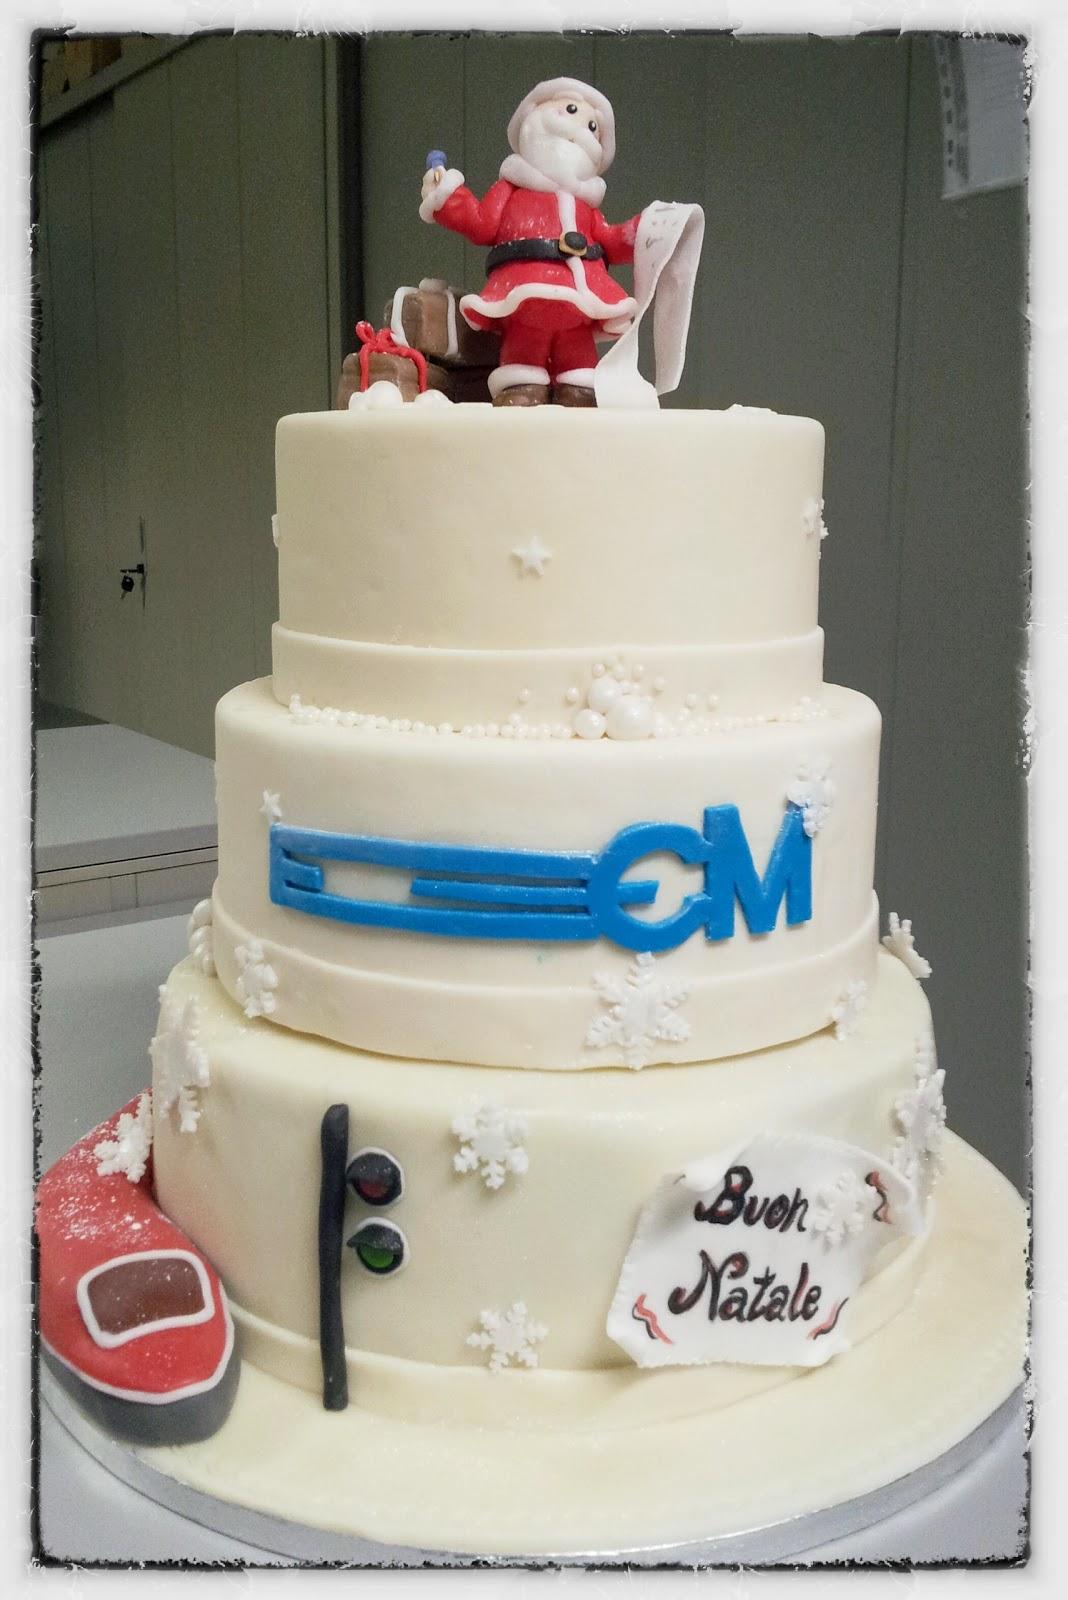 Torte Decorate Per Natale paola&alix in cakes: 2012